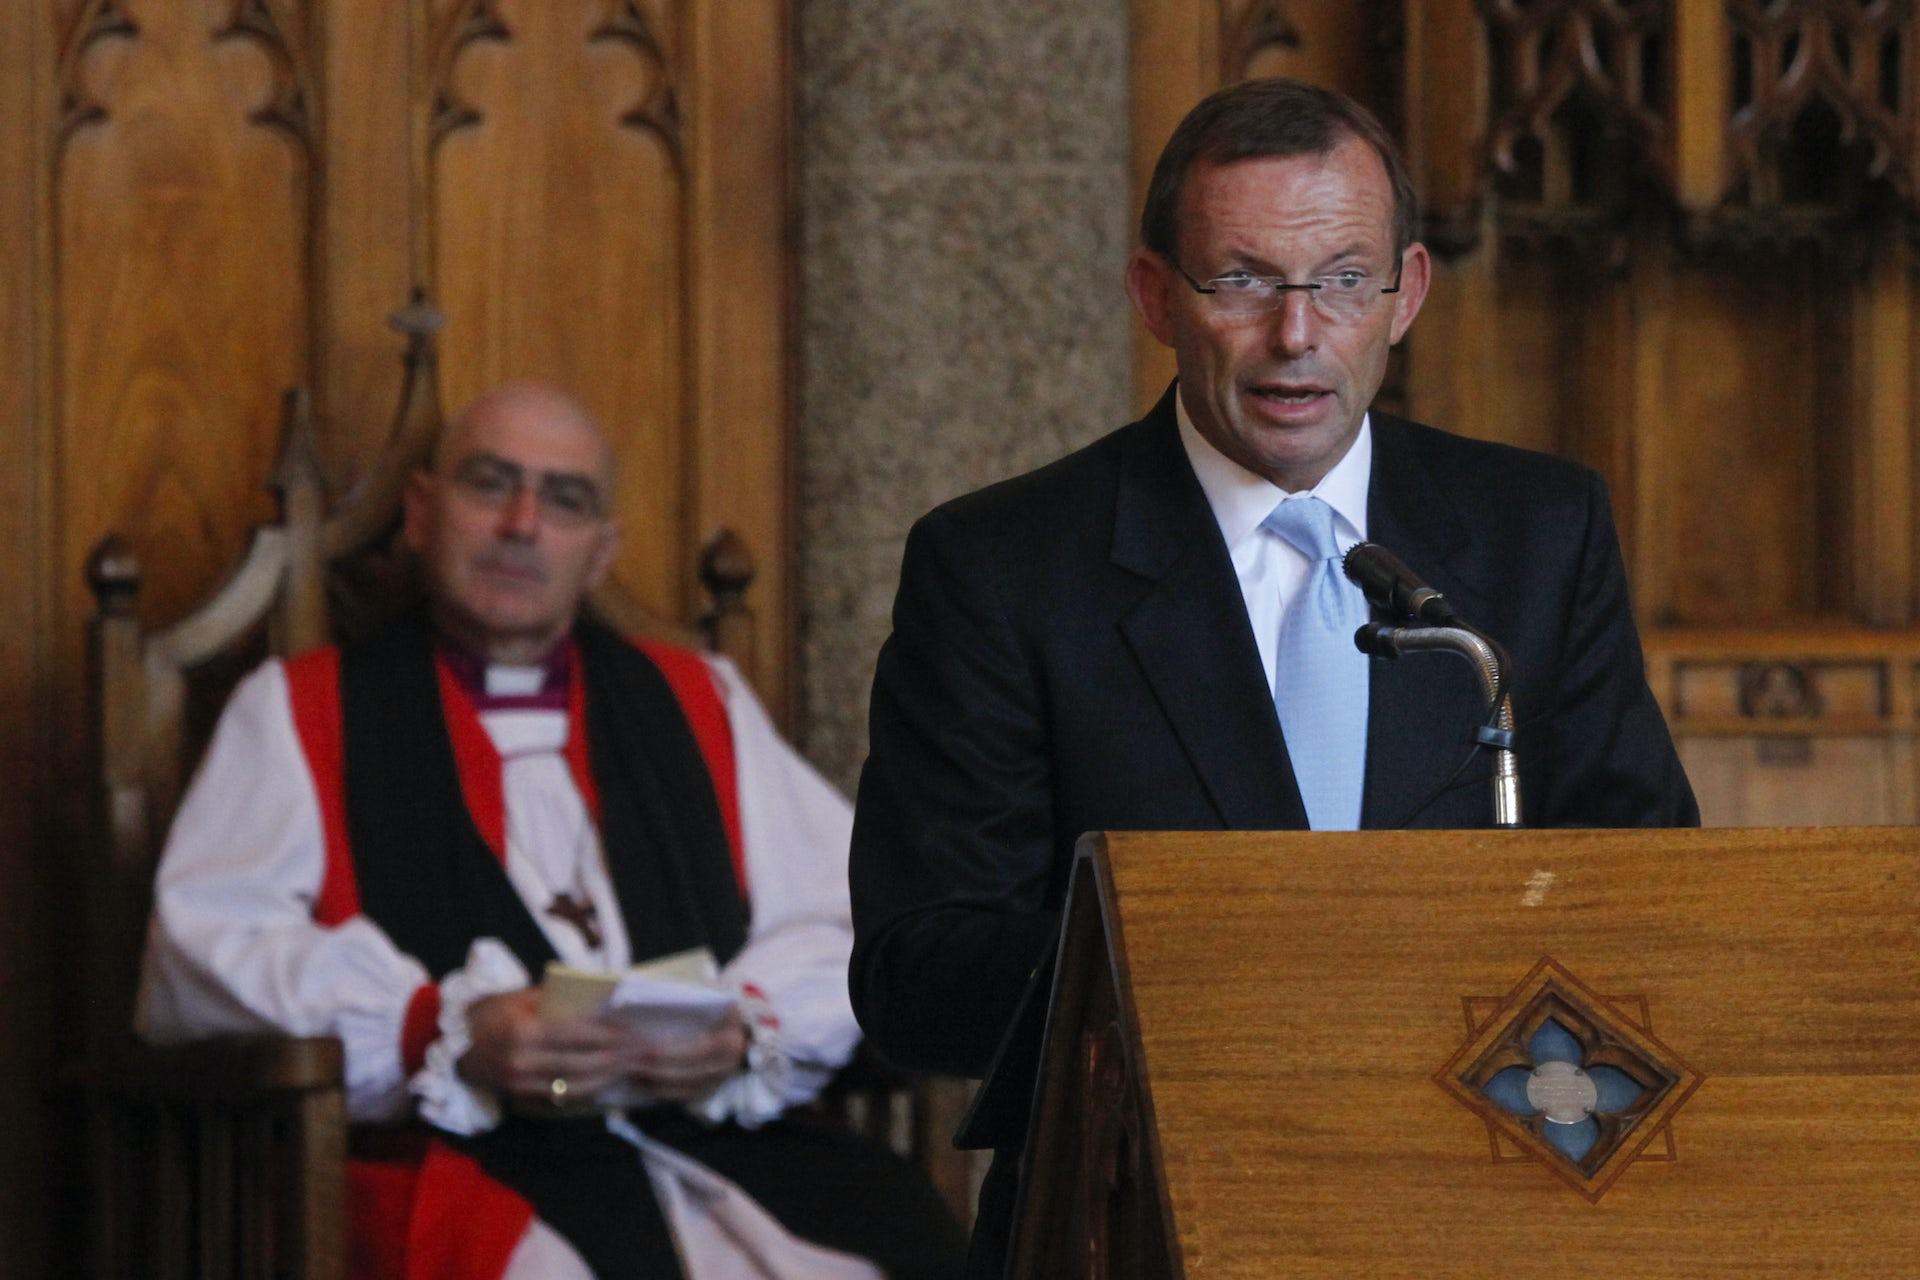 Chaplain challenge heads to High Court - JourneyOnline